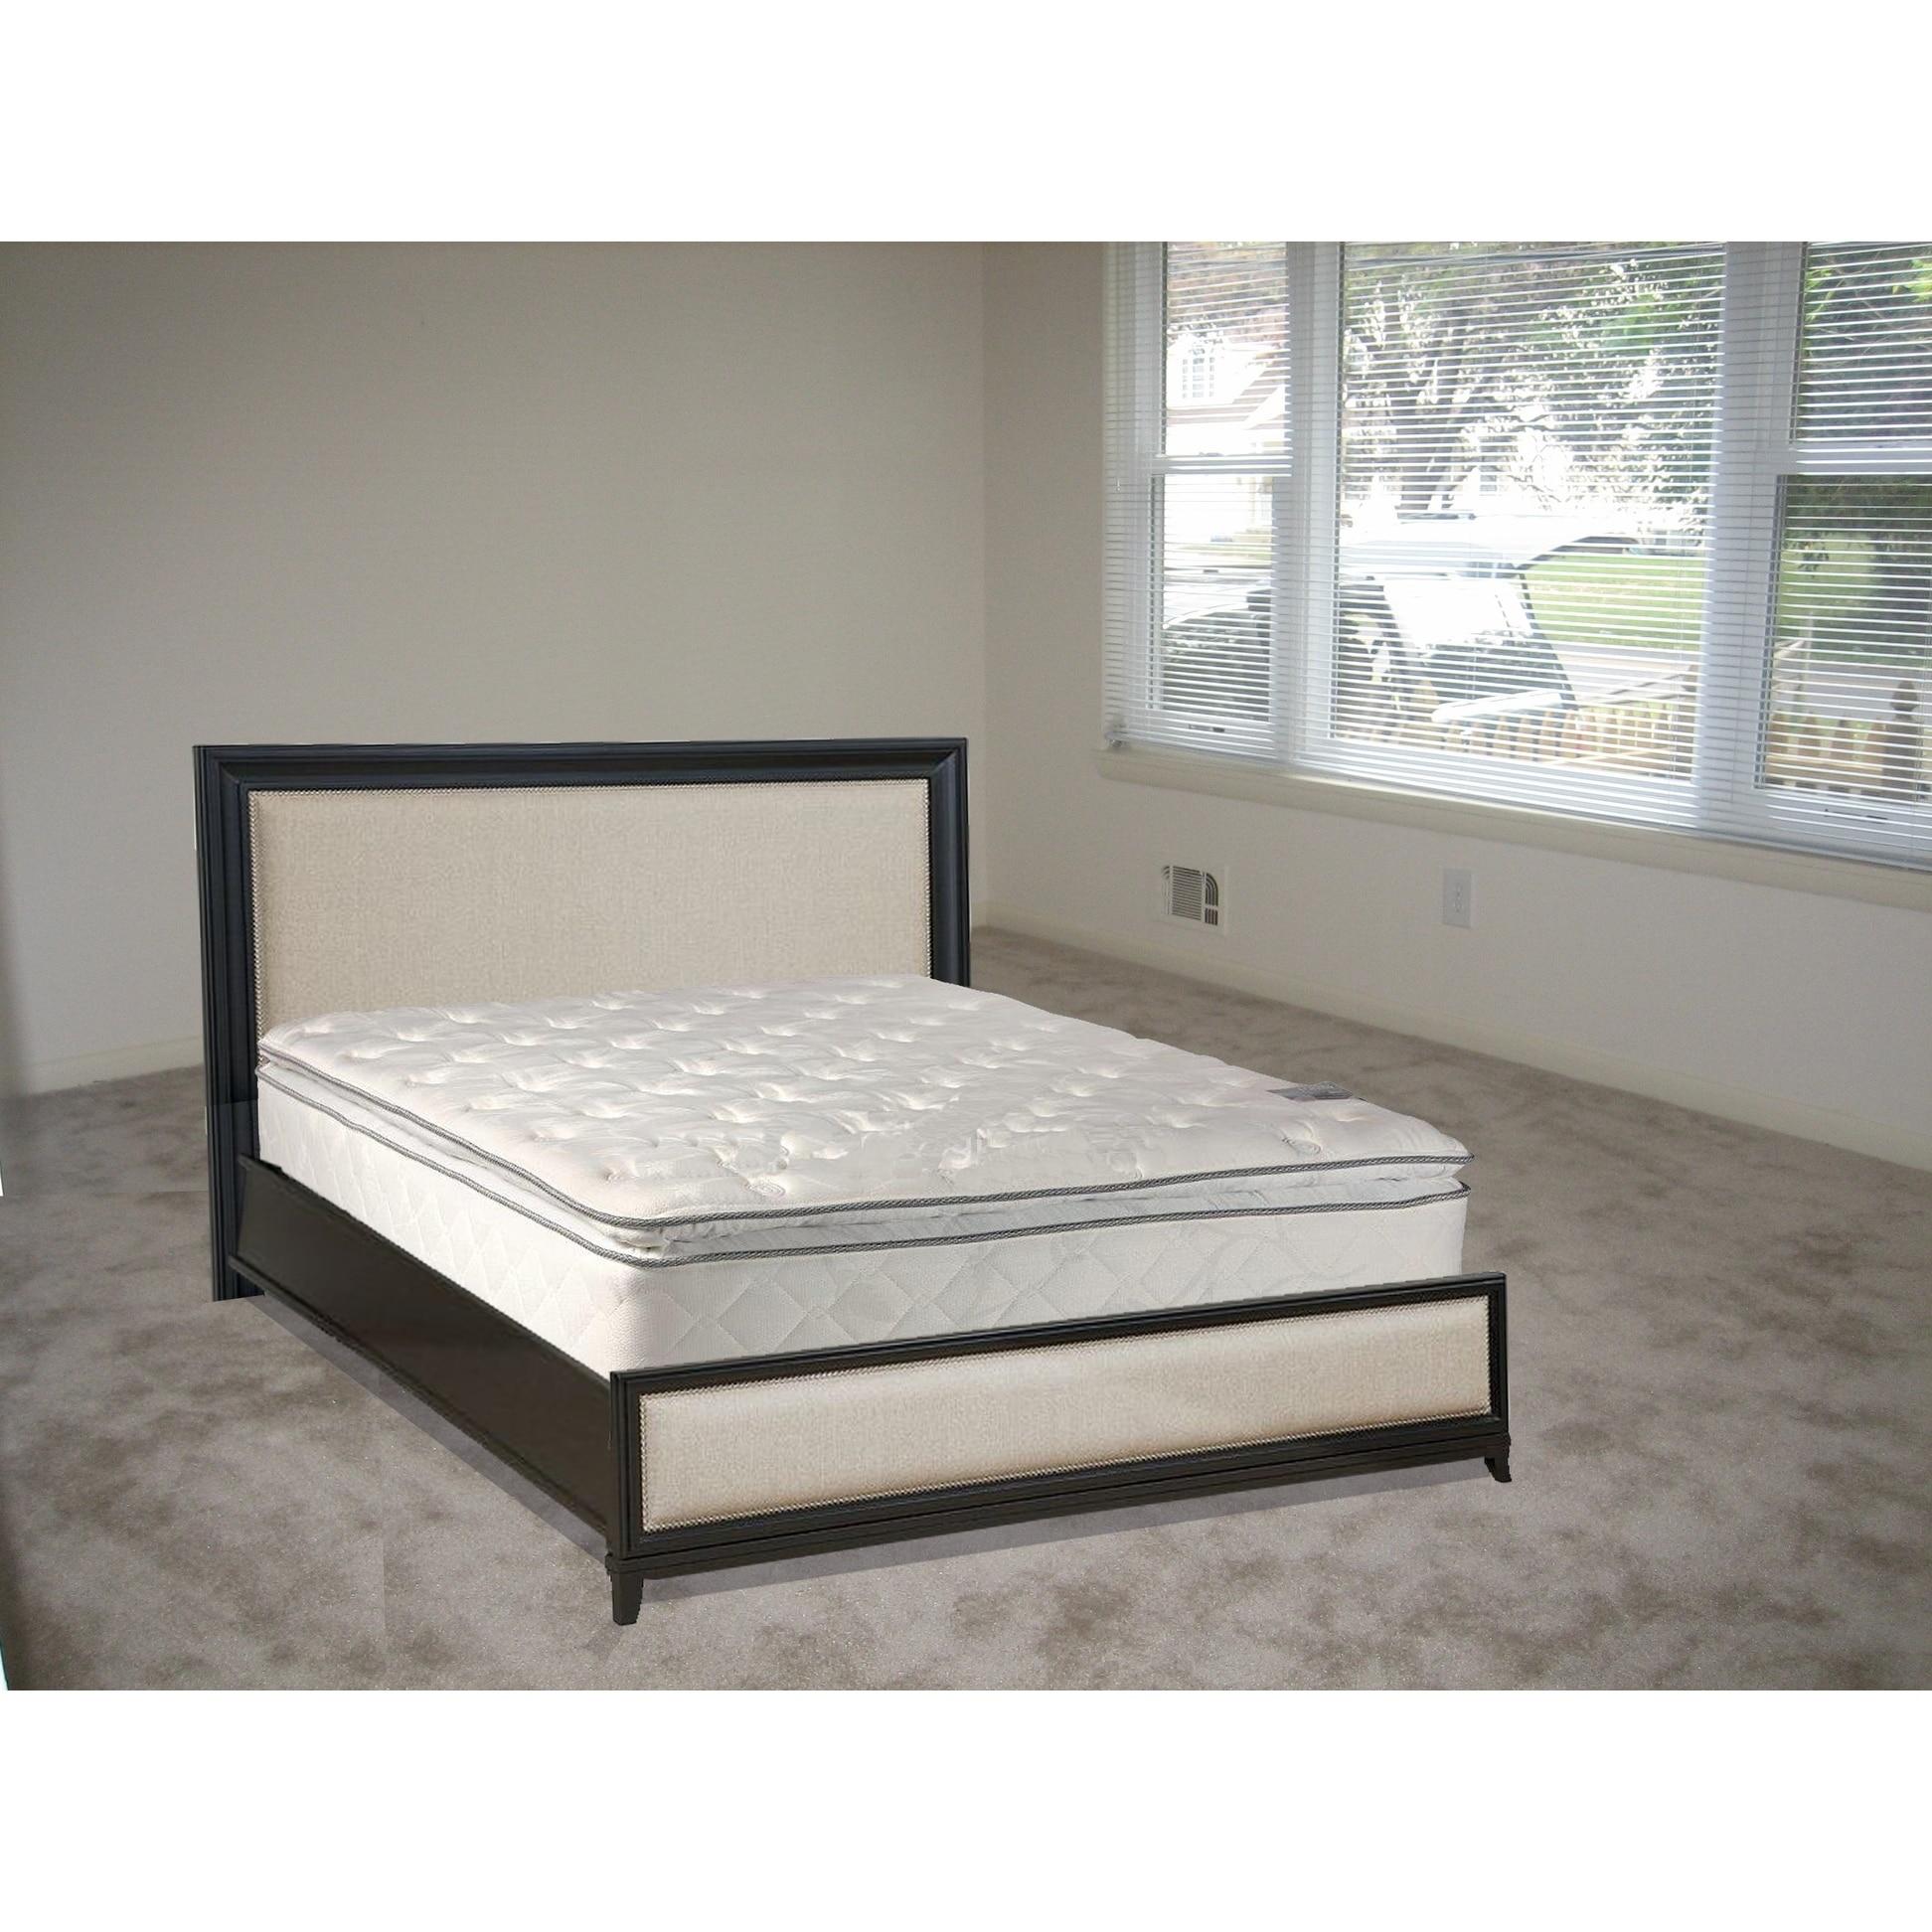 Continental Sleep , Medium Plush Pillowtop Doublesided Mattress, Full Size